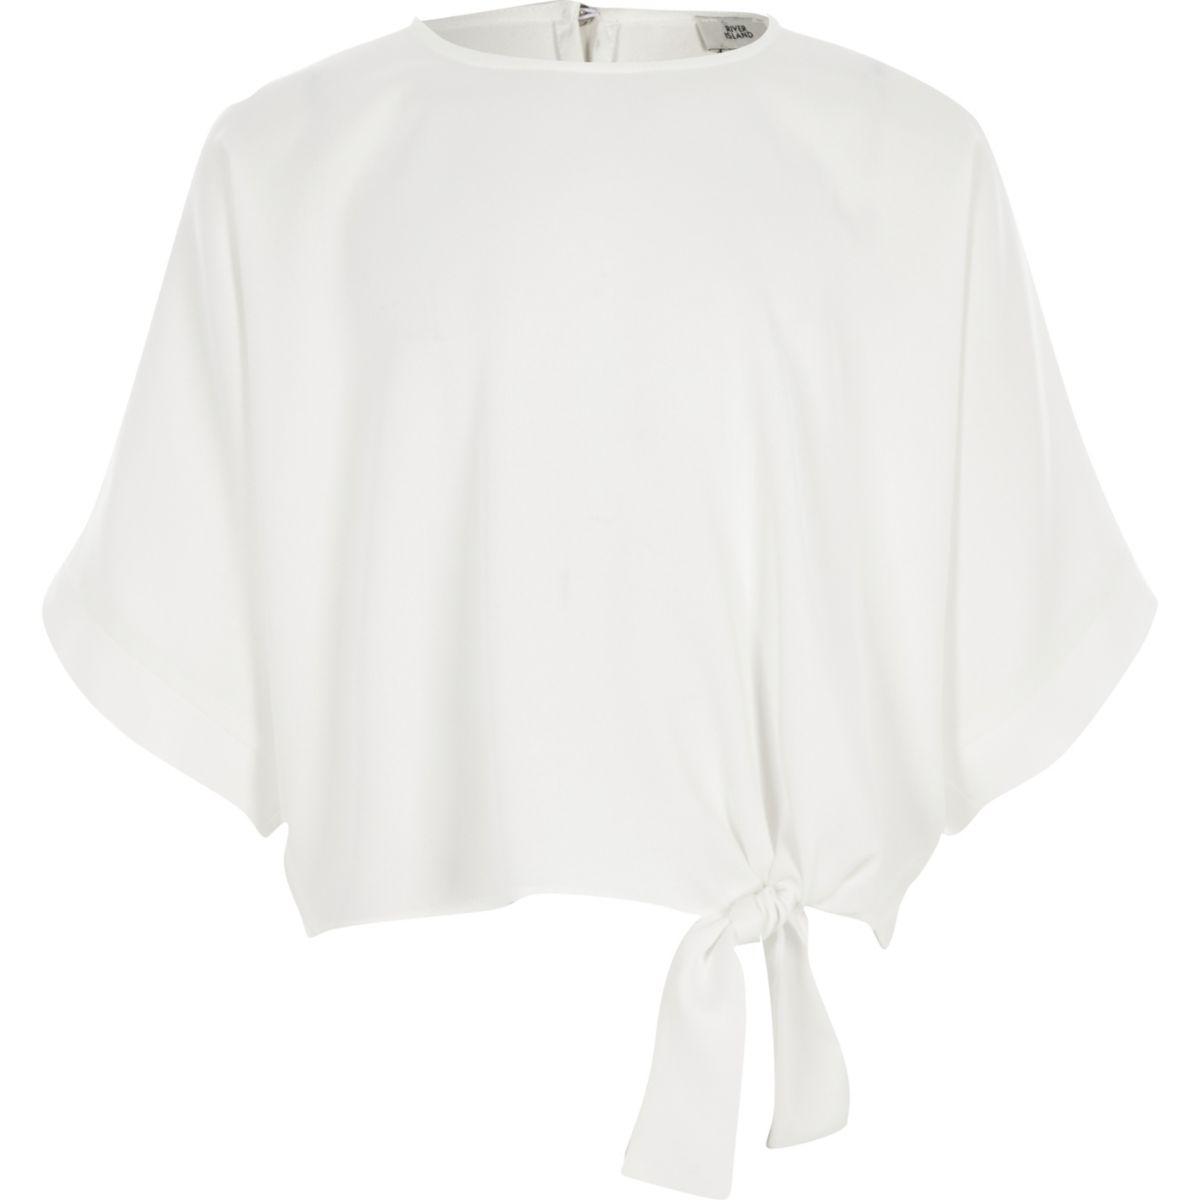 Girls white short sleeve tie side top